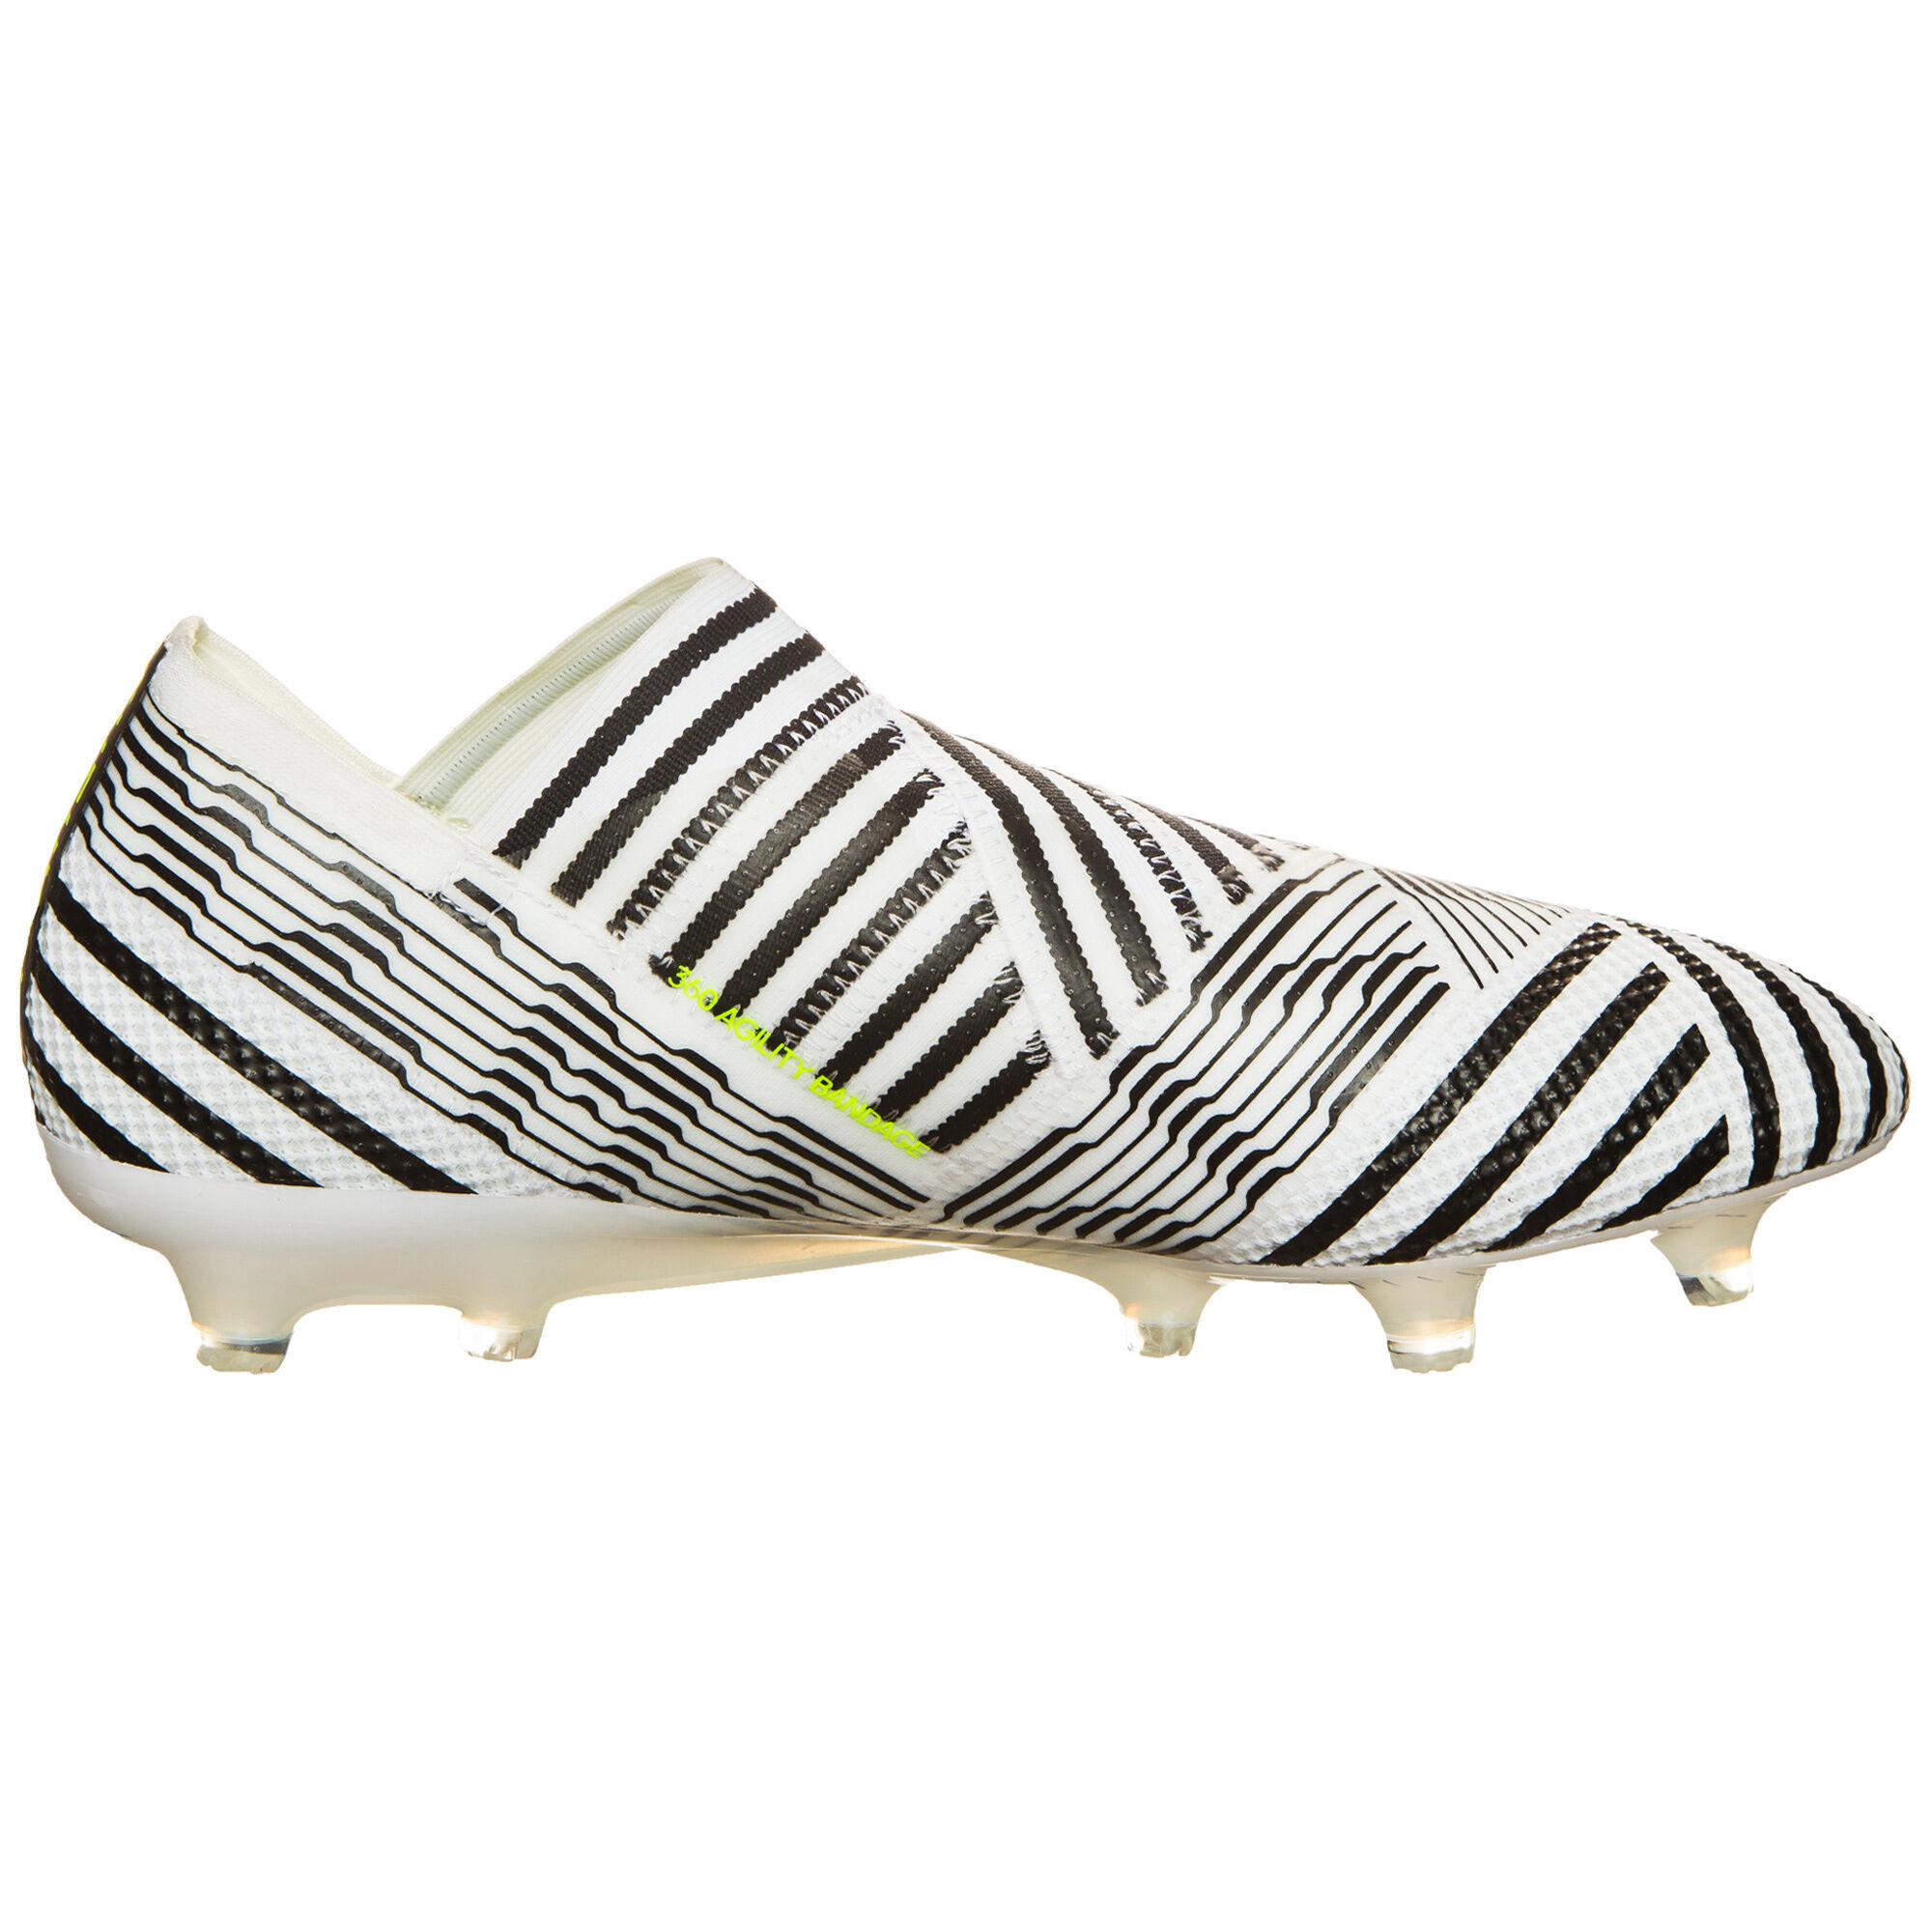 »Nemeziz 17+ 360agility« Fußballschuh, weiß, weiß-schwarz adidas Performance